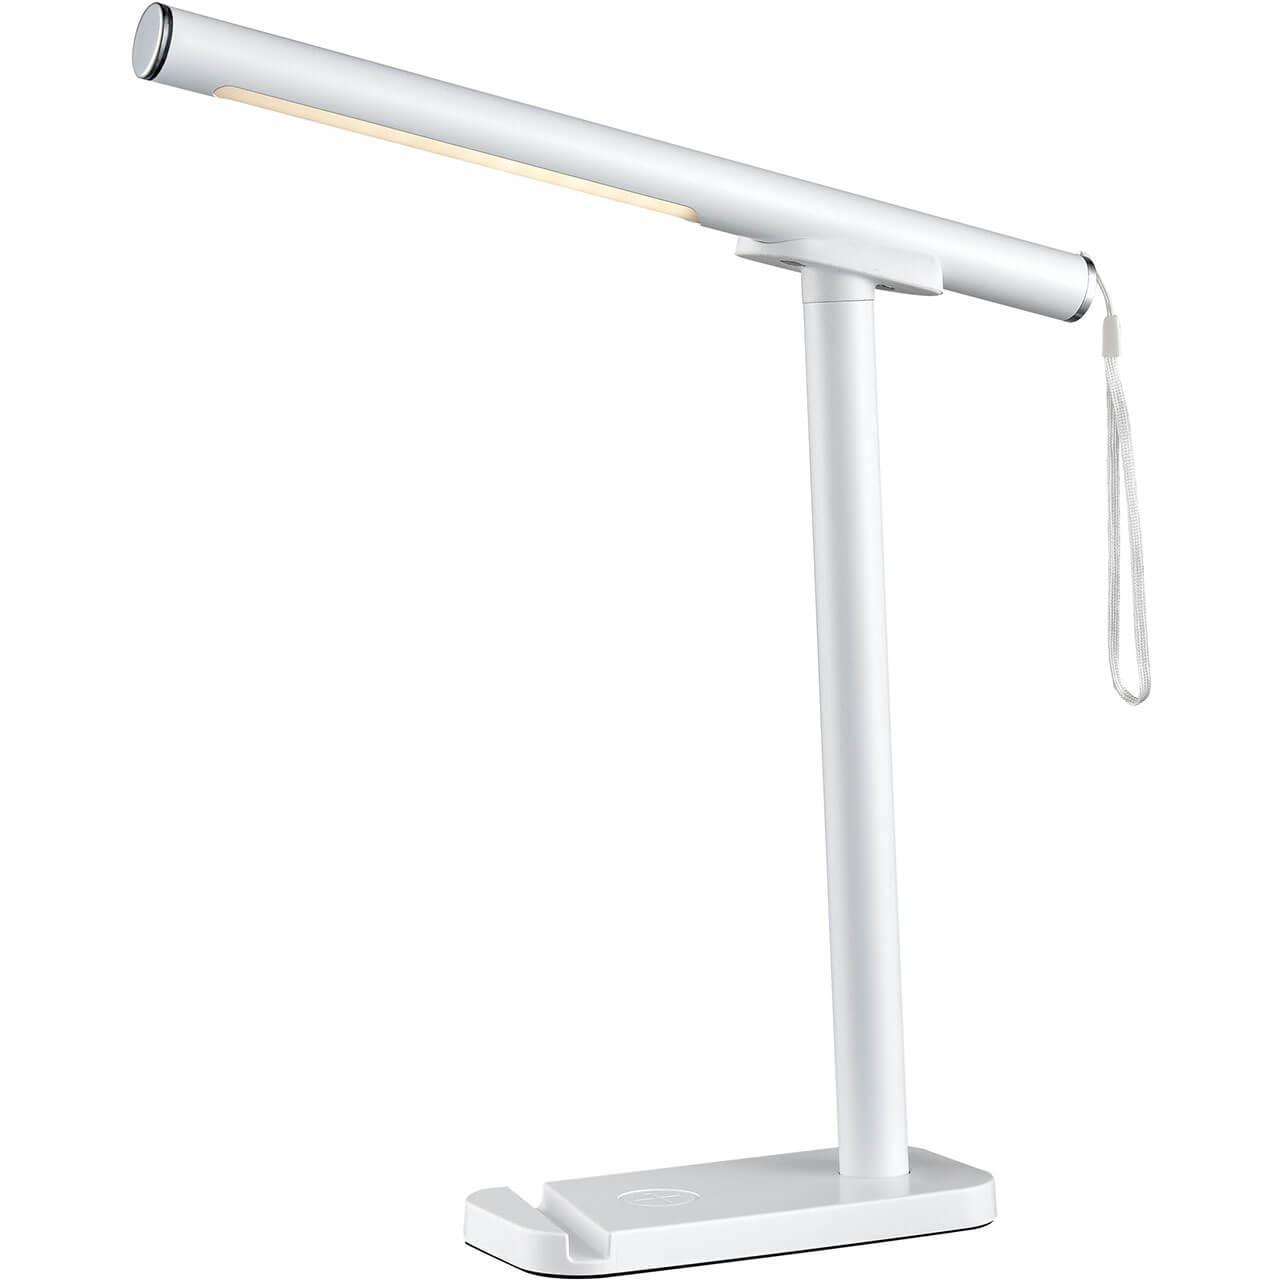 Настольная лампа Vele Luce Toto VL2021N01 настольная лампа декоративная vele luce toppi vl1841n01